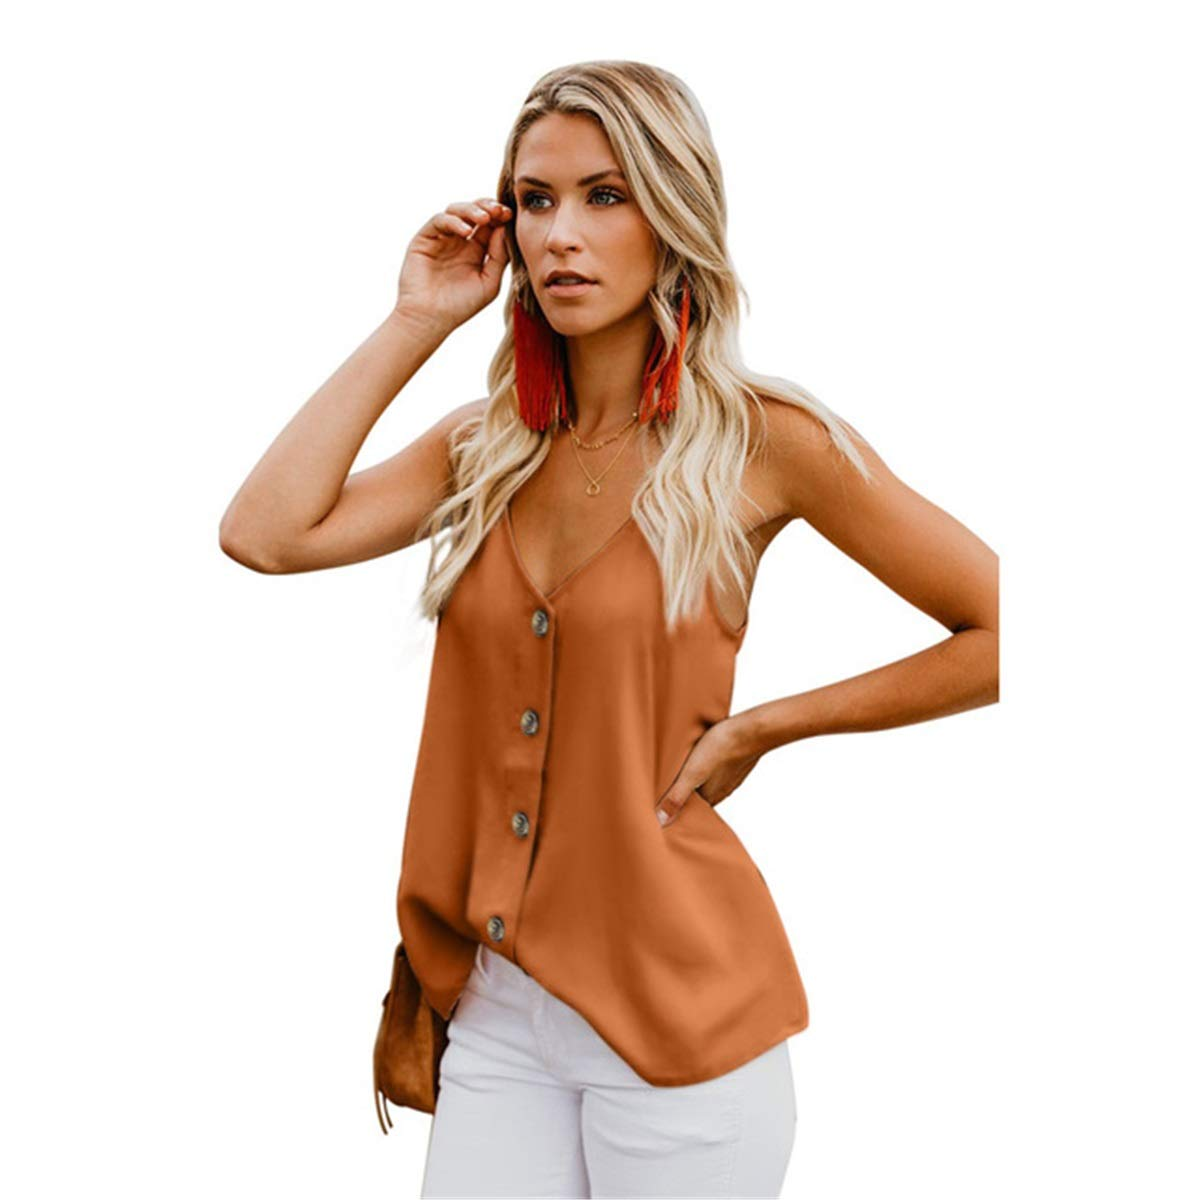 Zoowi Summer Explosion New Vest T-Shirt Female V-Neck Single-Breasted Sleeveless Halter Sling Top